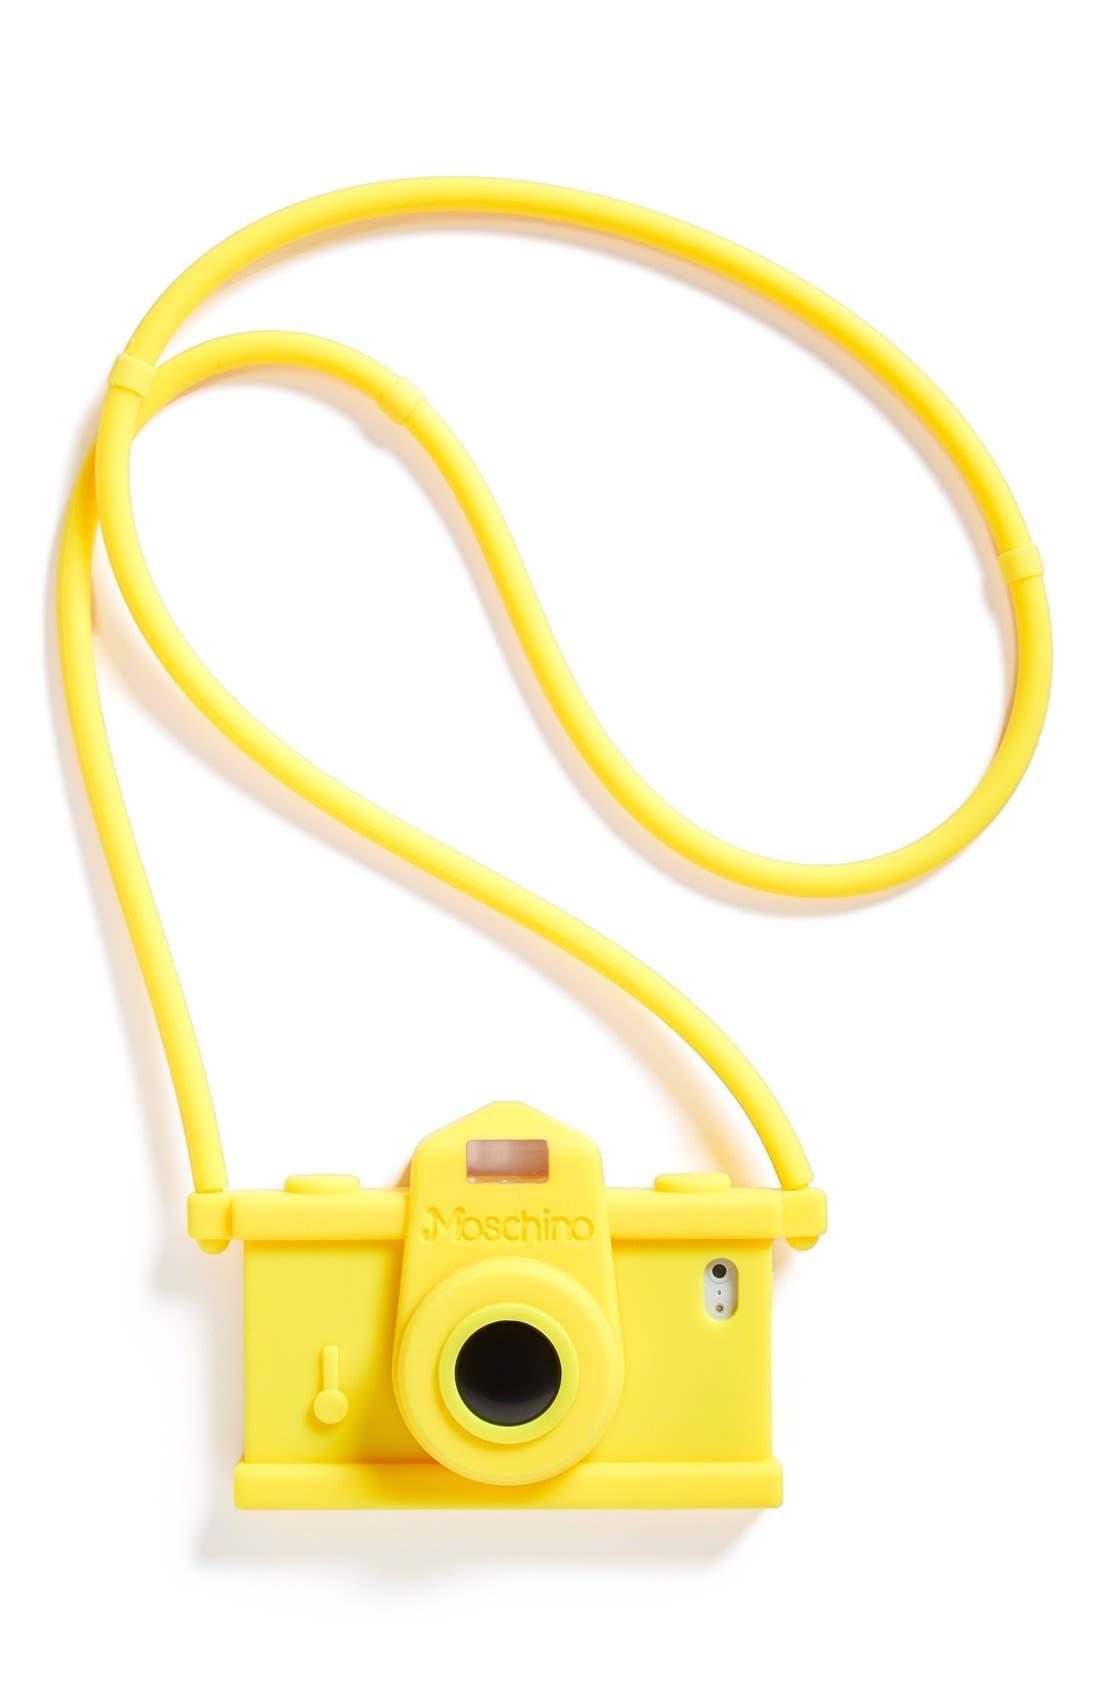 Main Image - Moschino Camera iPhone 5, 5s &5c Case